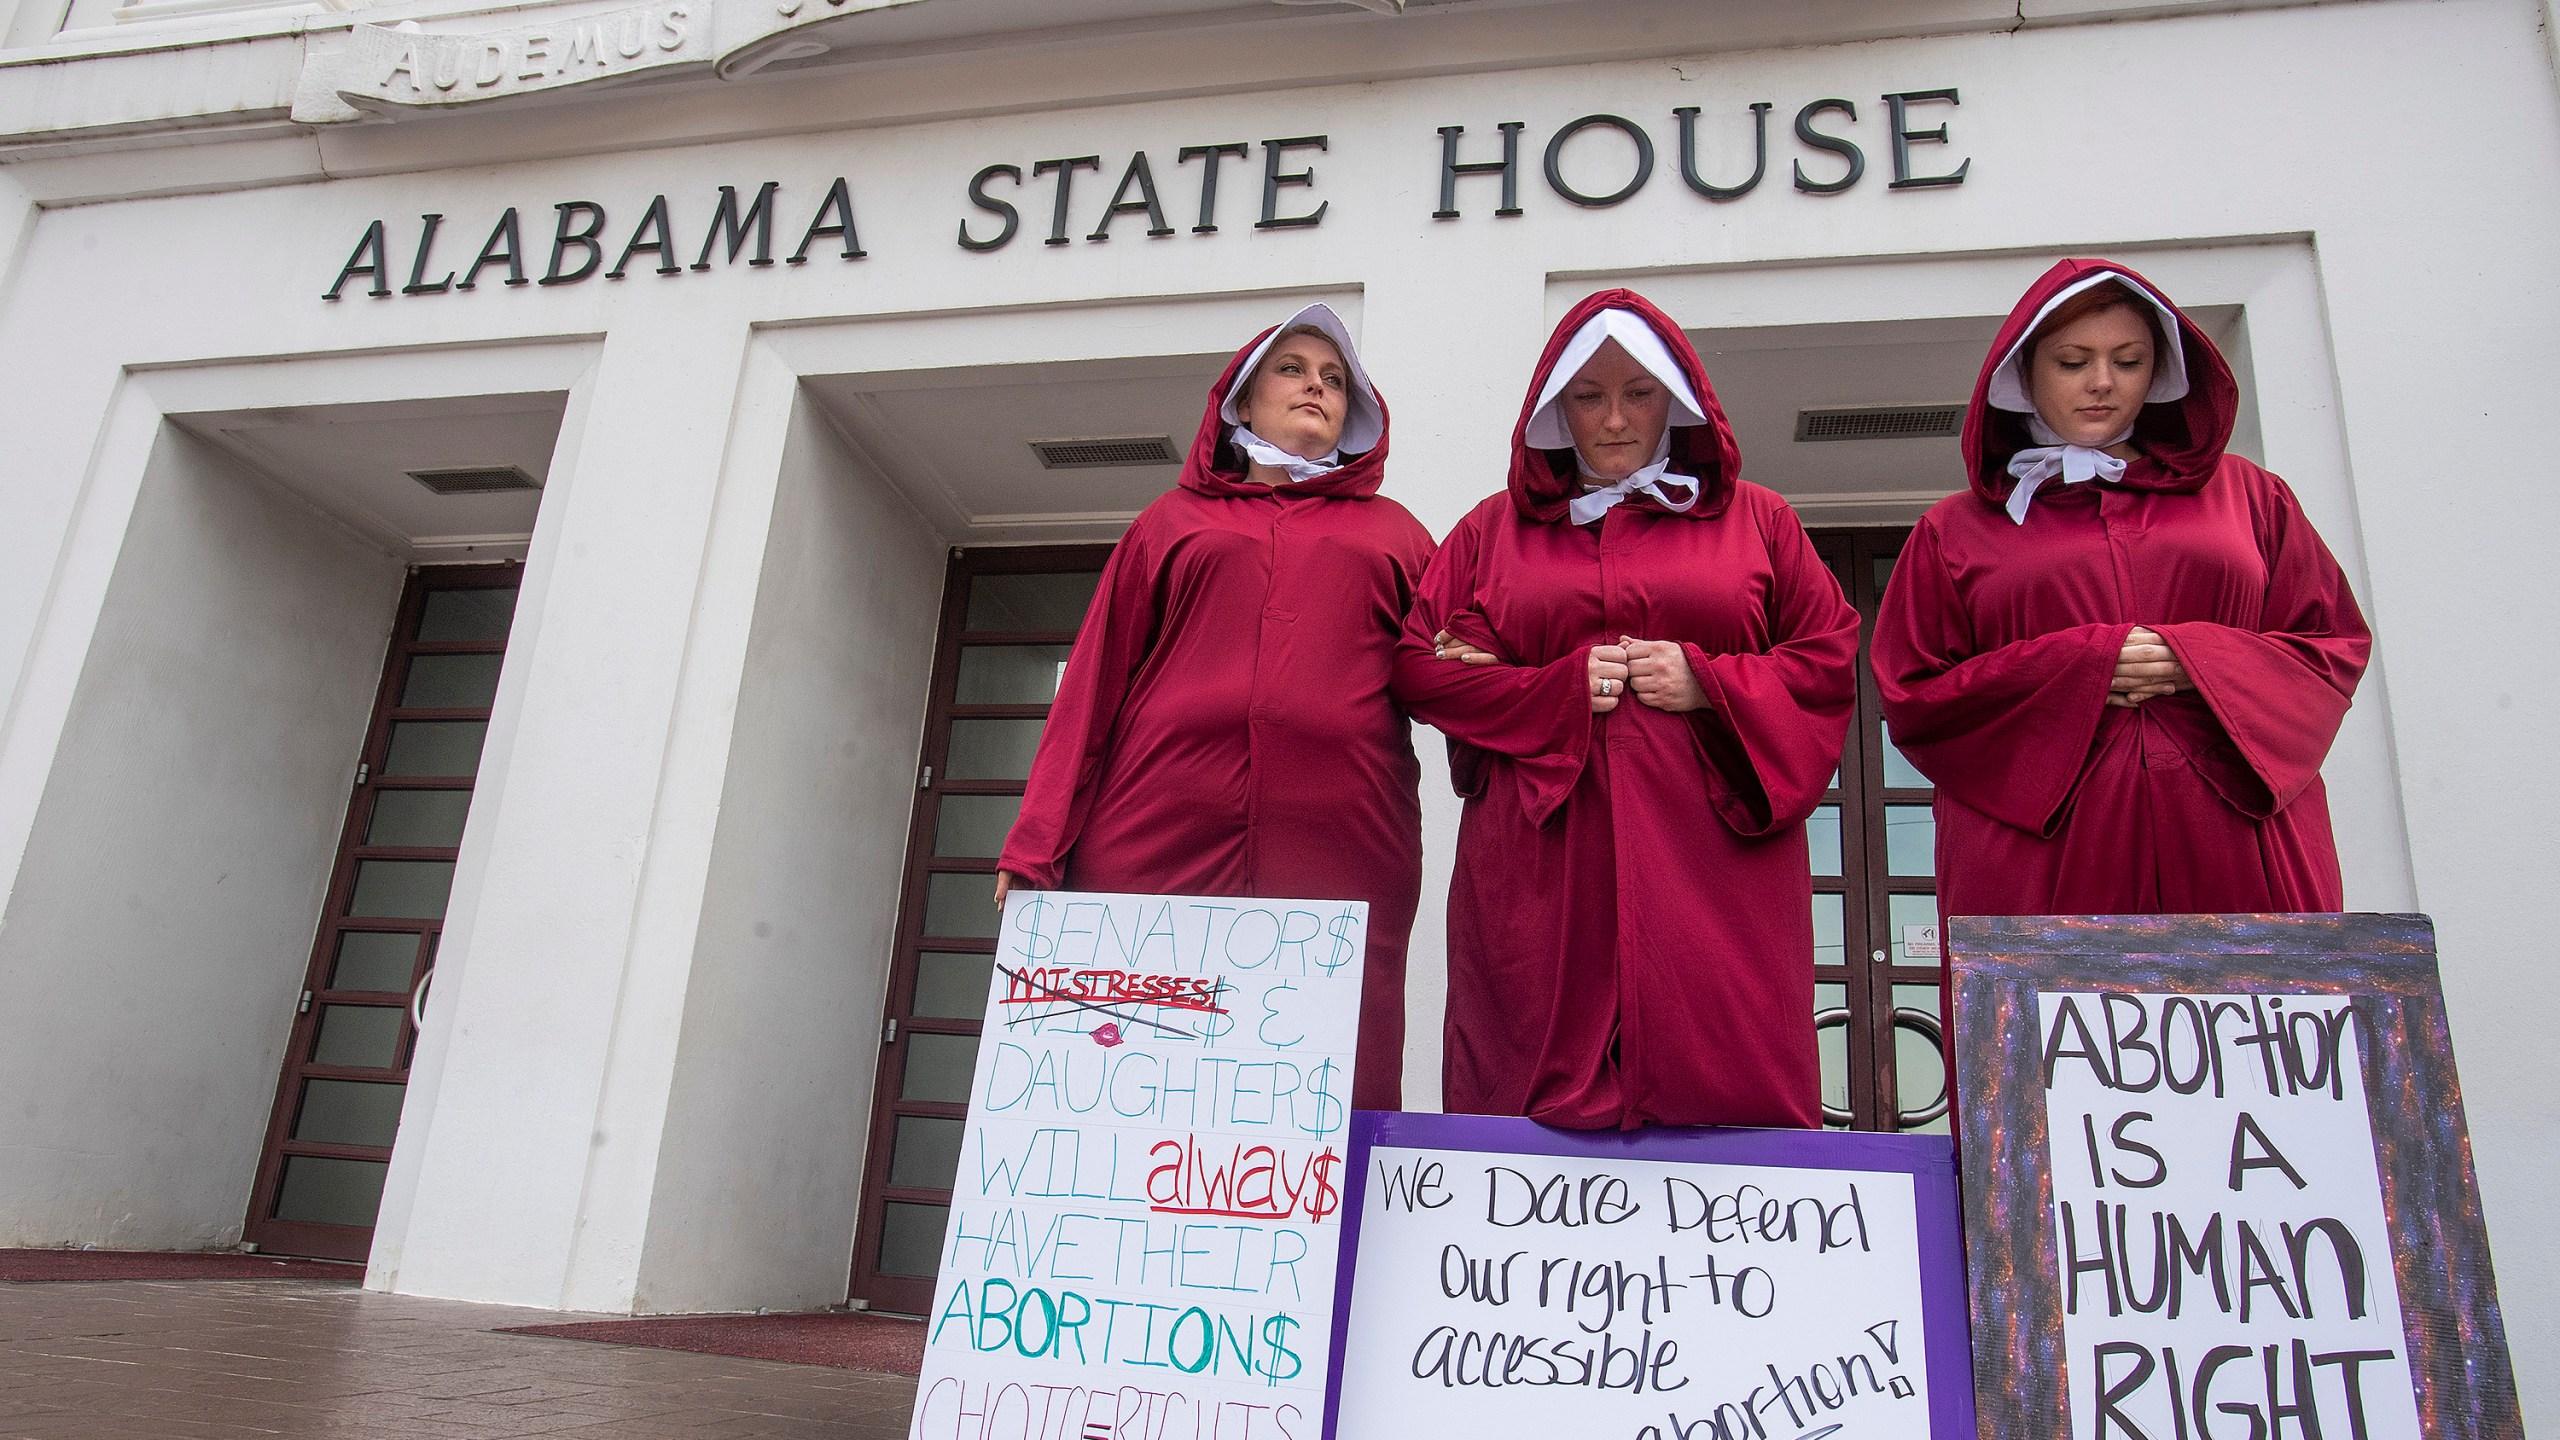 Abortion_Alabama_31563-159532.jpg75494128